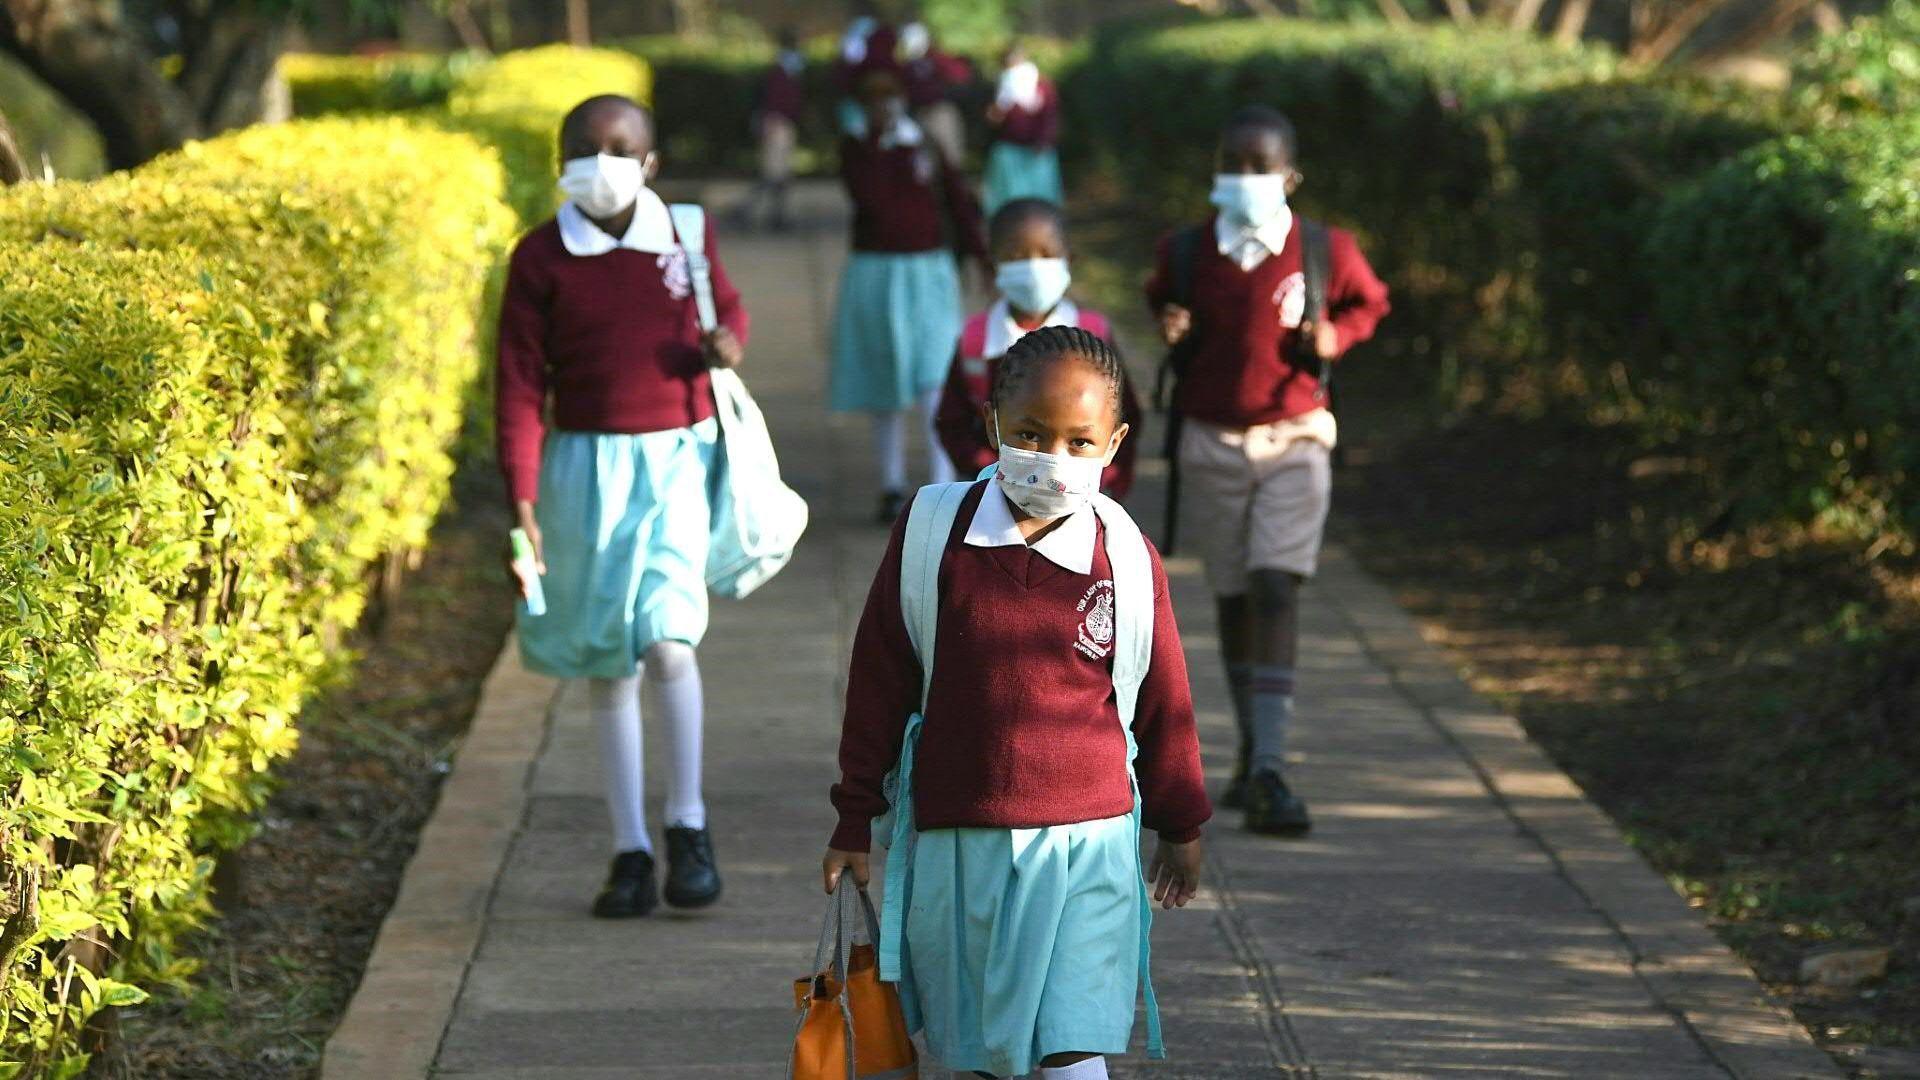 Schulen in Kenia öffnen nach monatelanger Corona-Pause